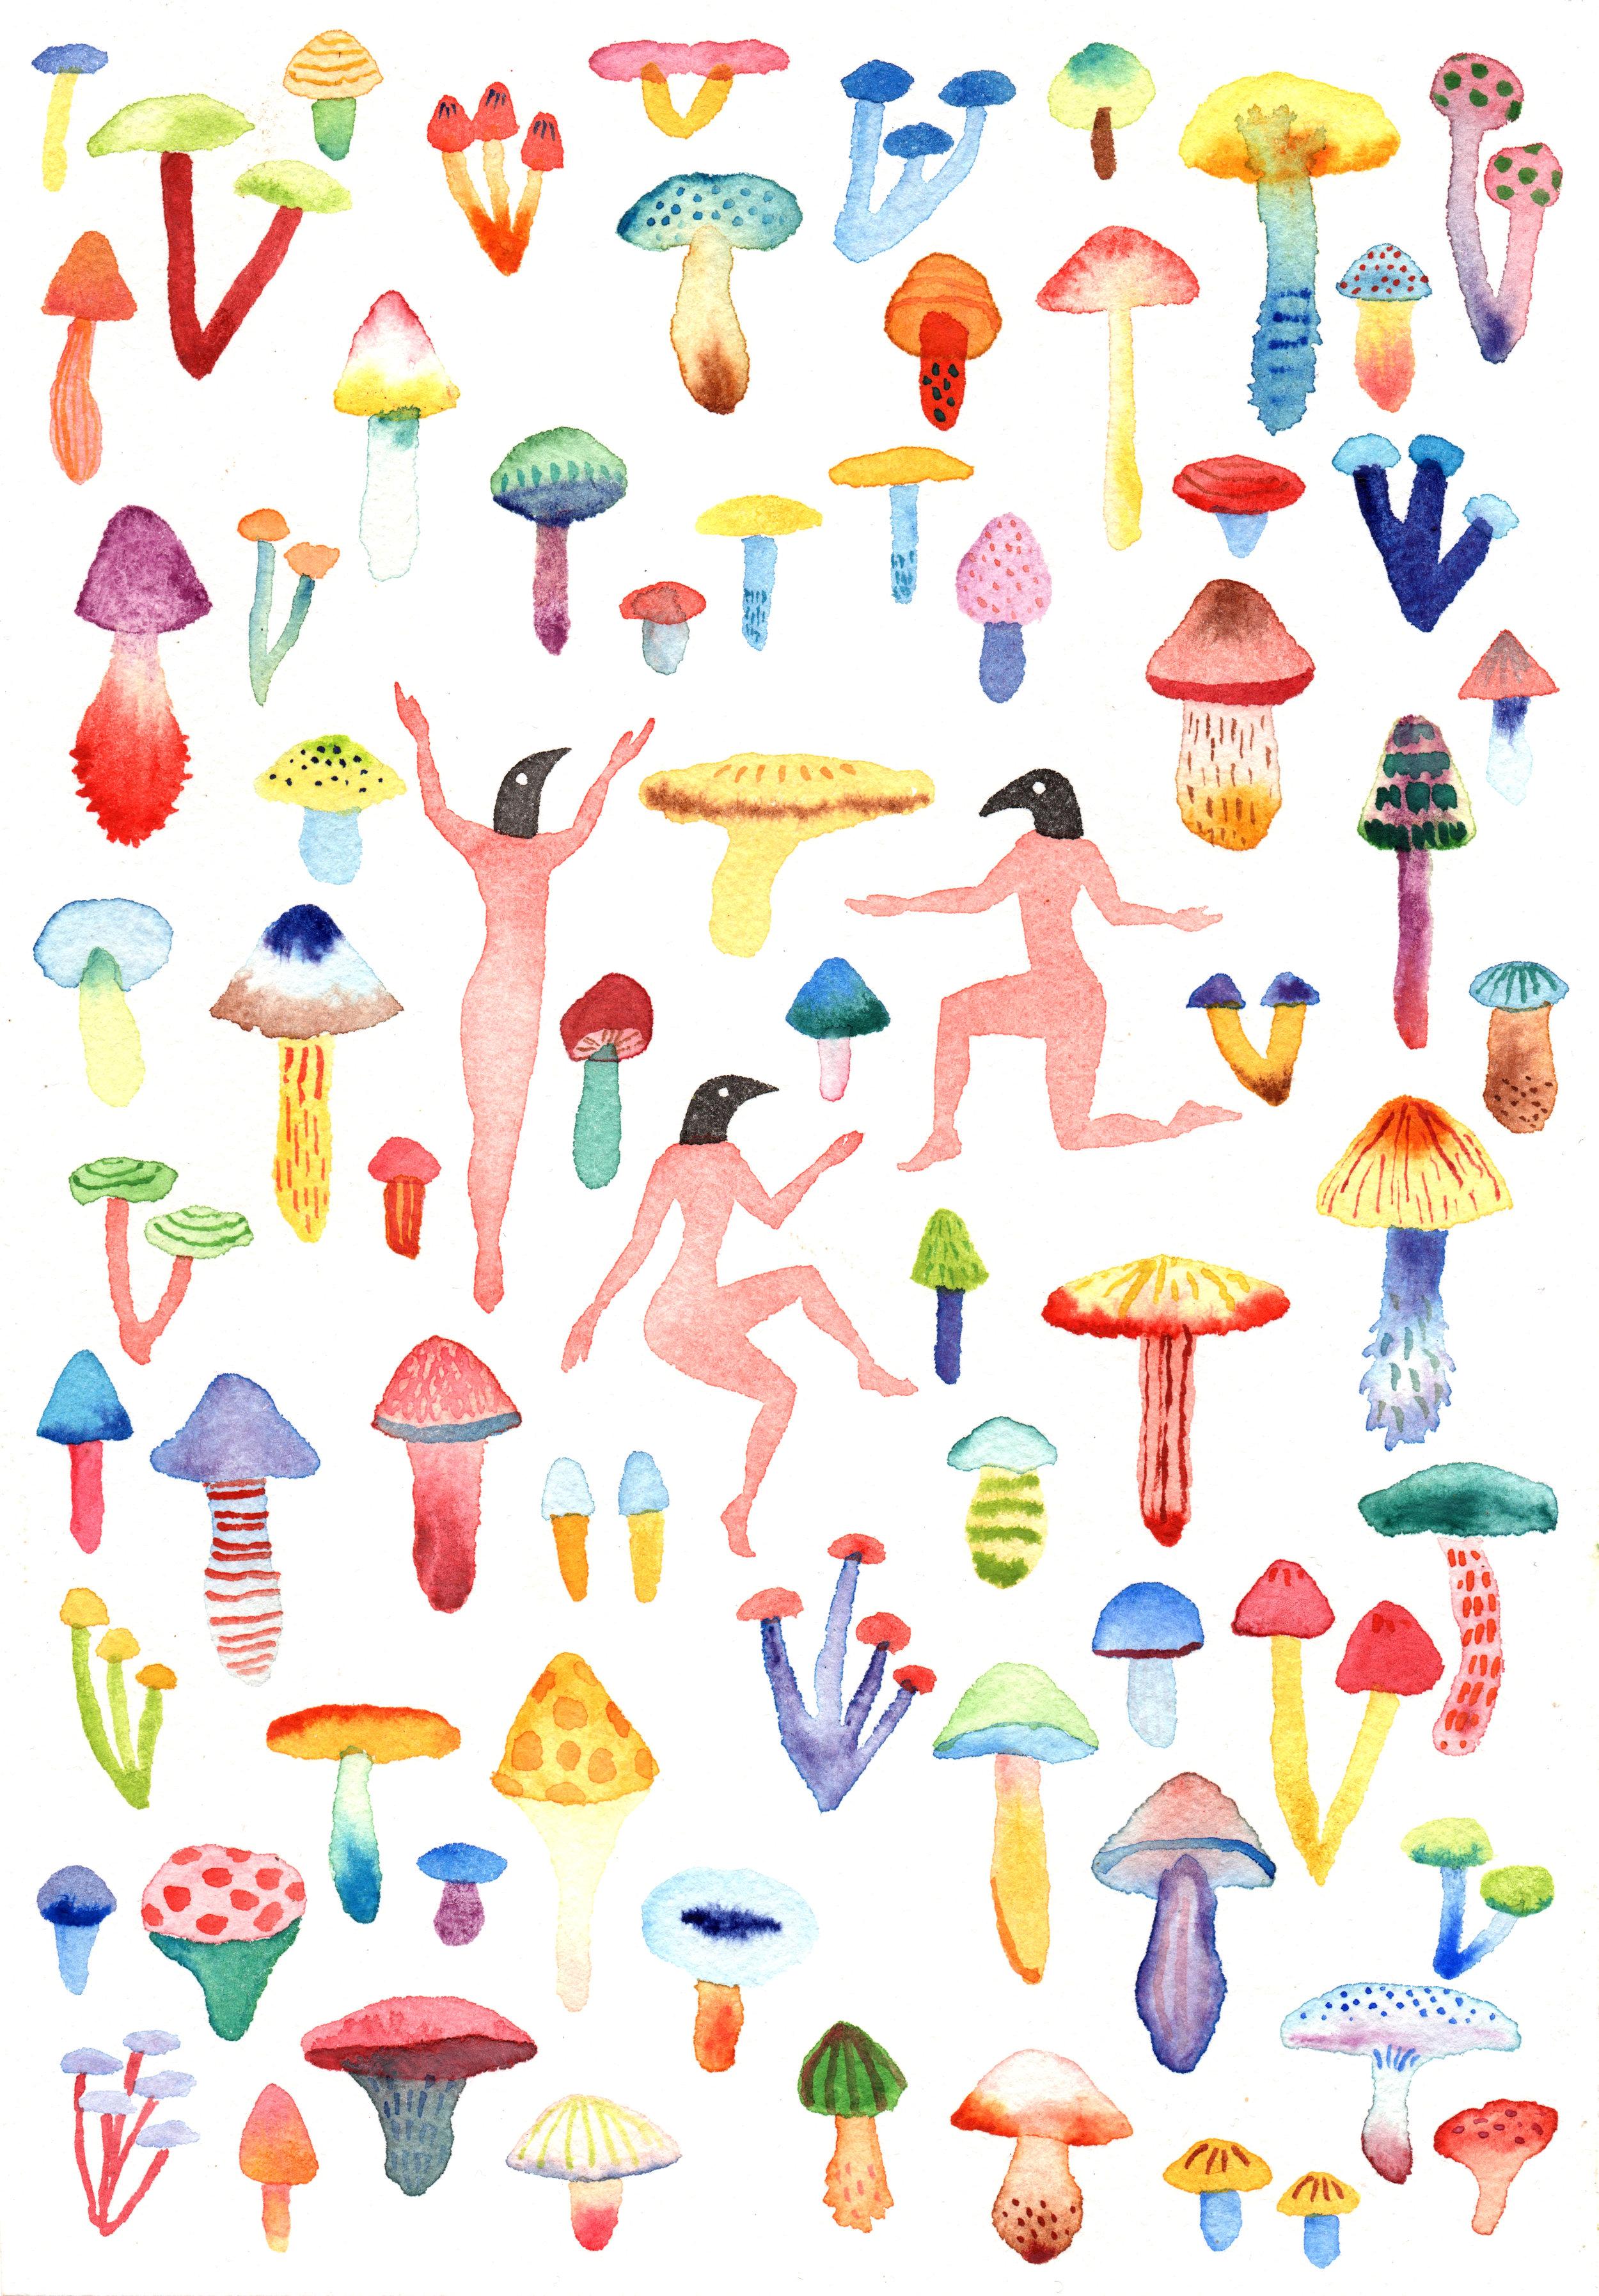 mushroomparty2_edit.jpg